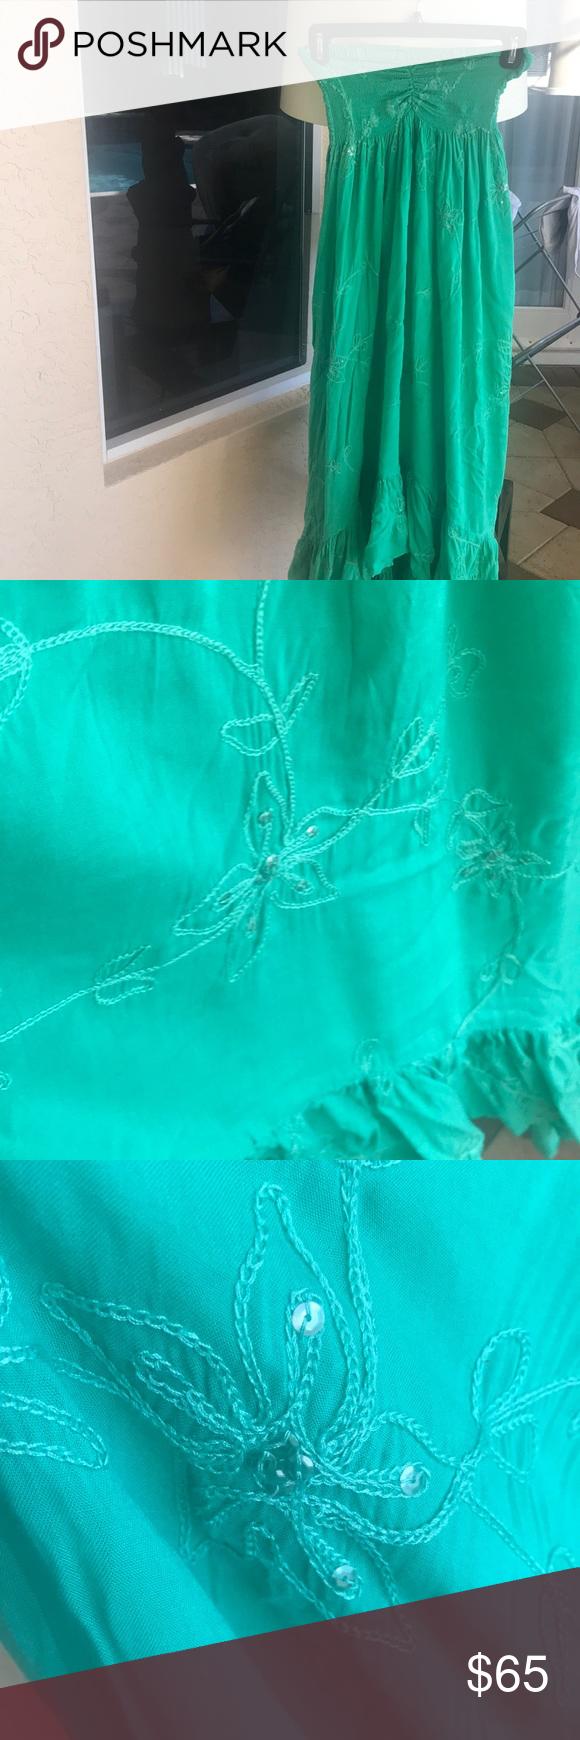 Green dress short in front long in back  Beautiful green sequin sundress  My Posh Closet  Pinterest  Sequins